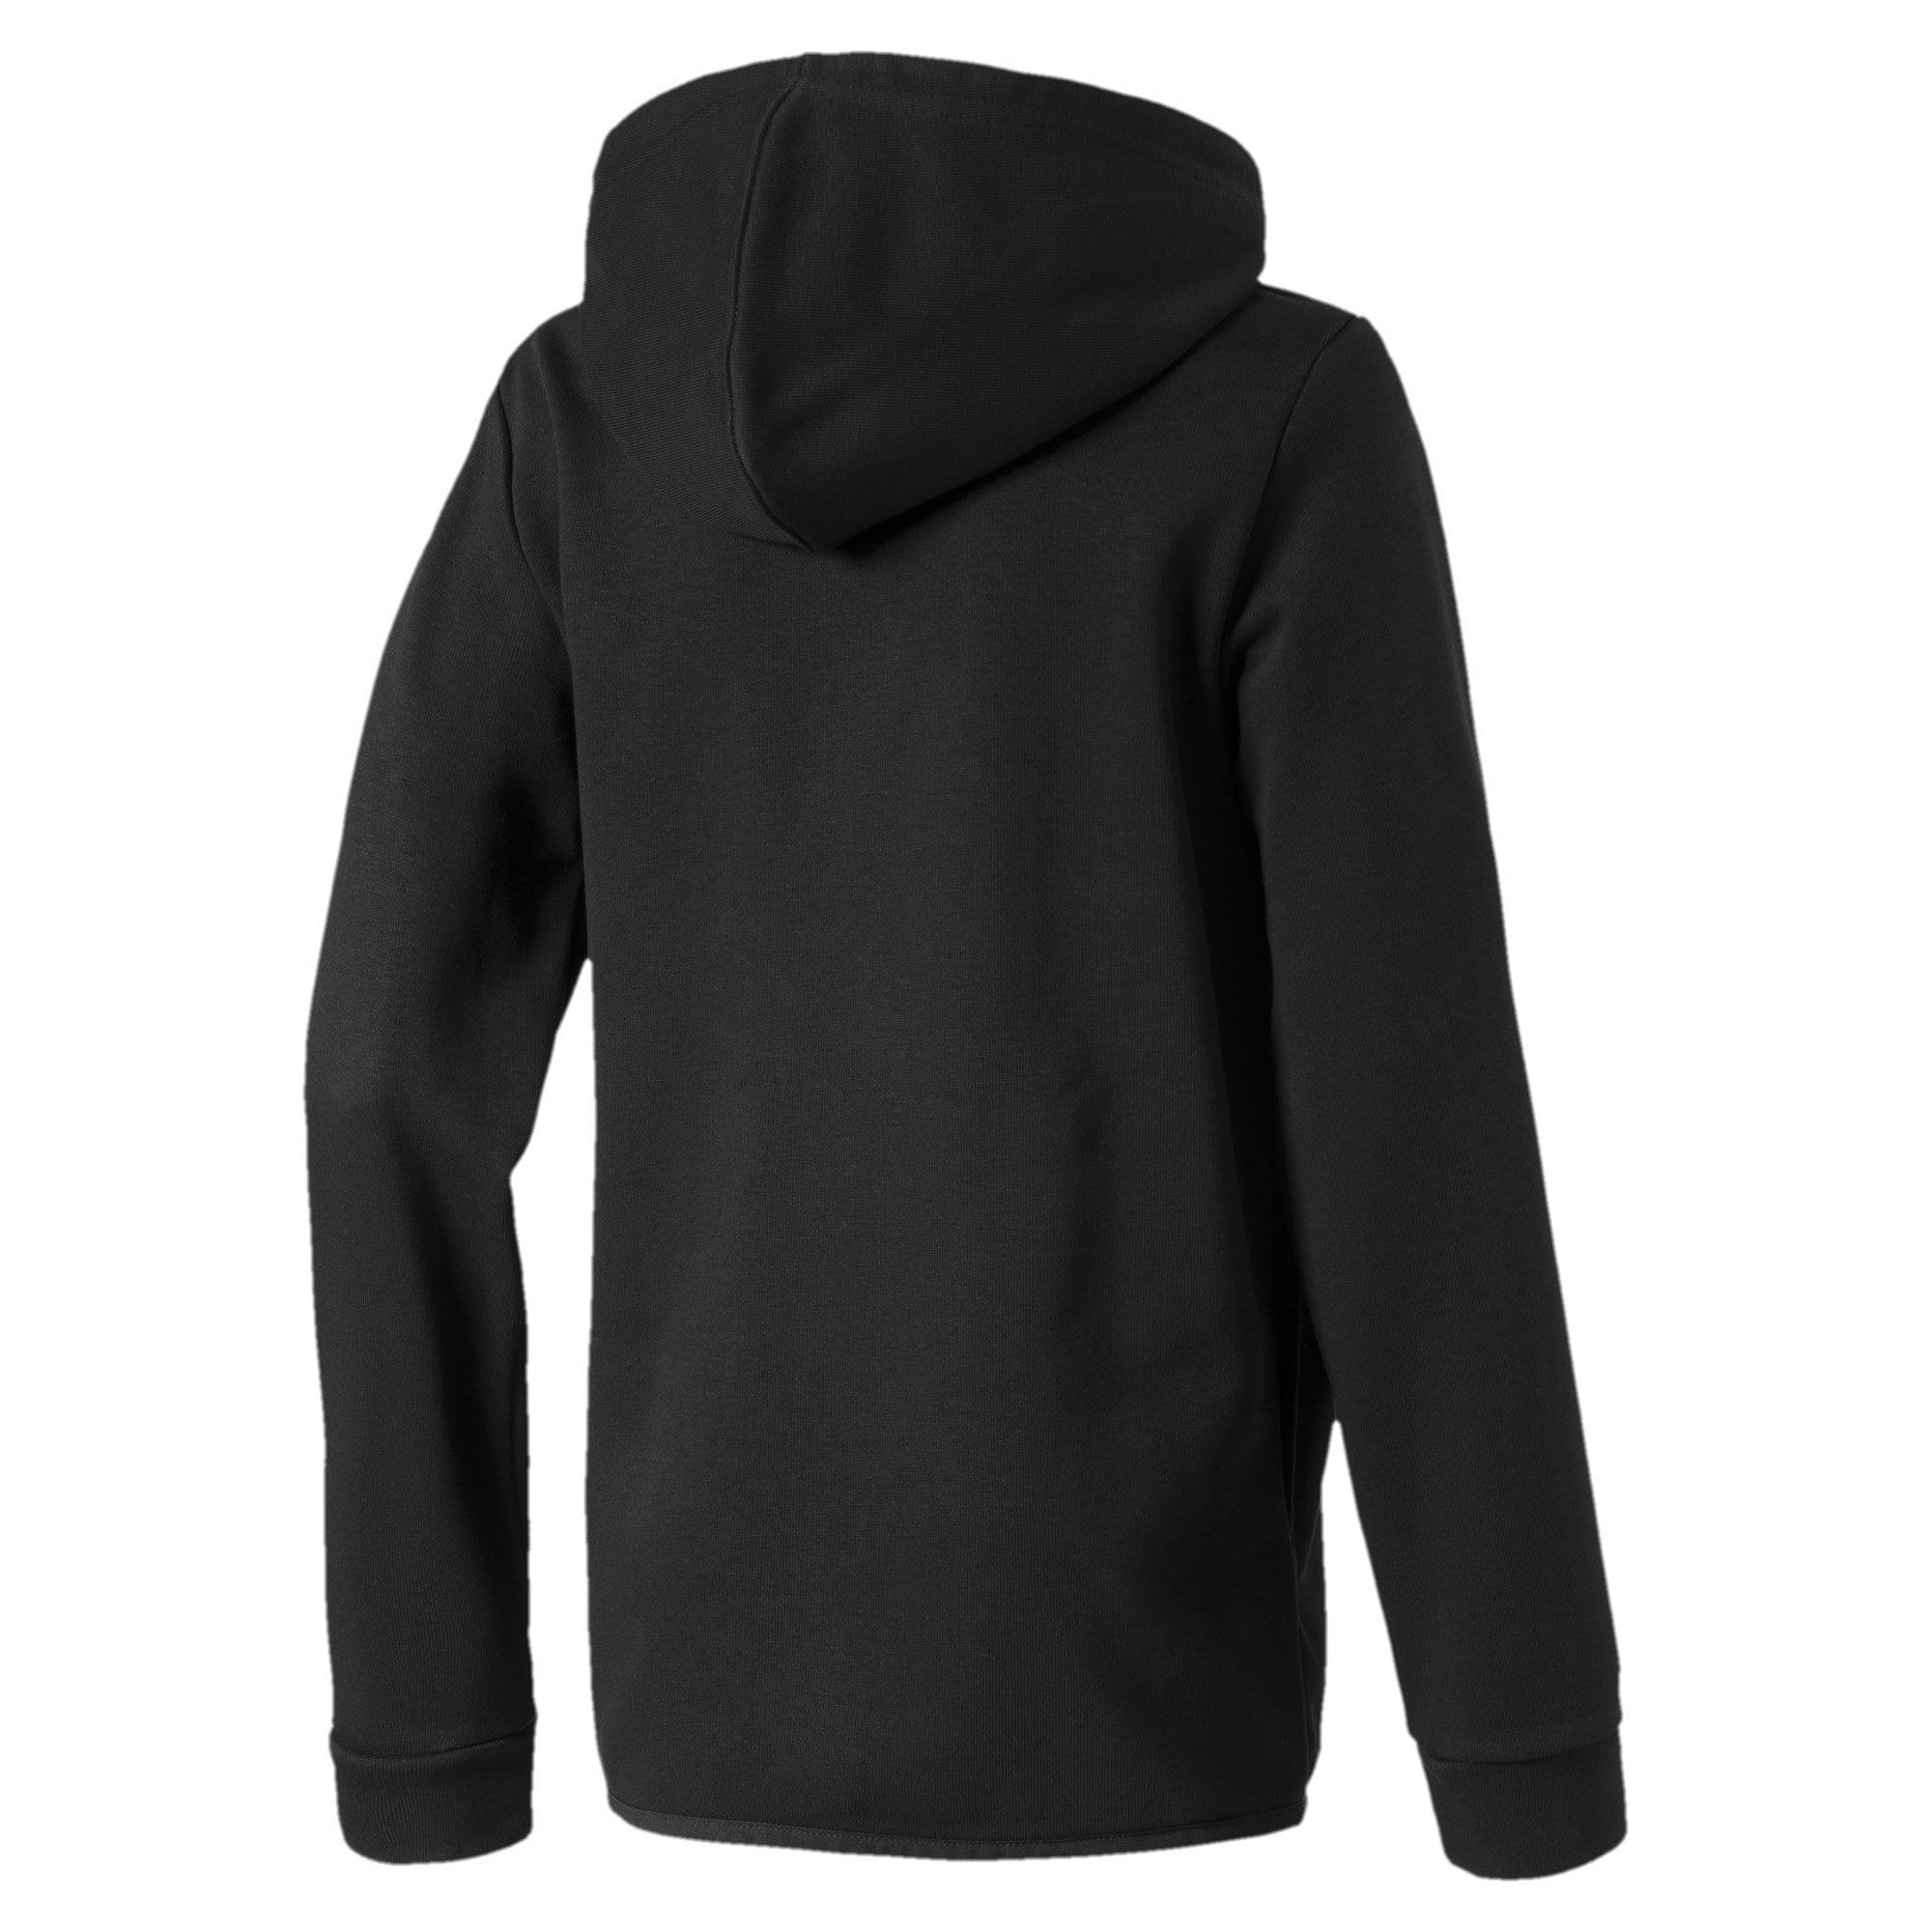 Thumbnail 2 of Active Sports Hooded Jacket, Puma Black, medium-IND